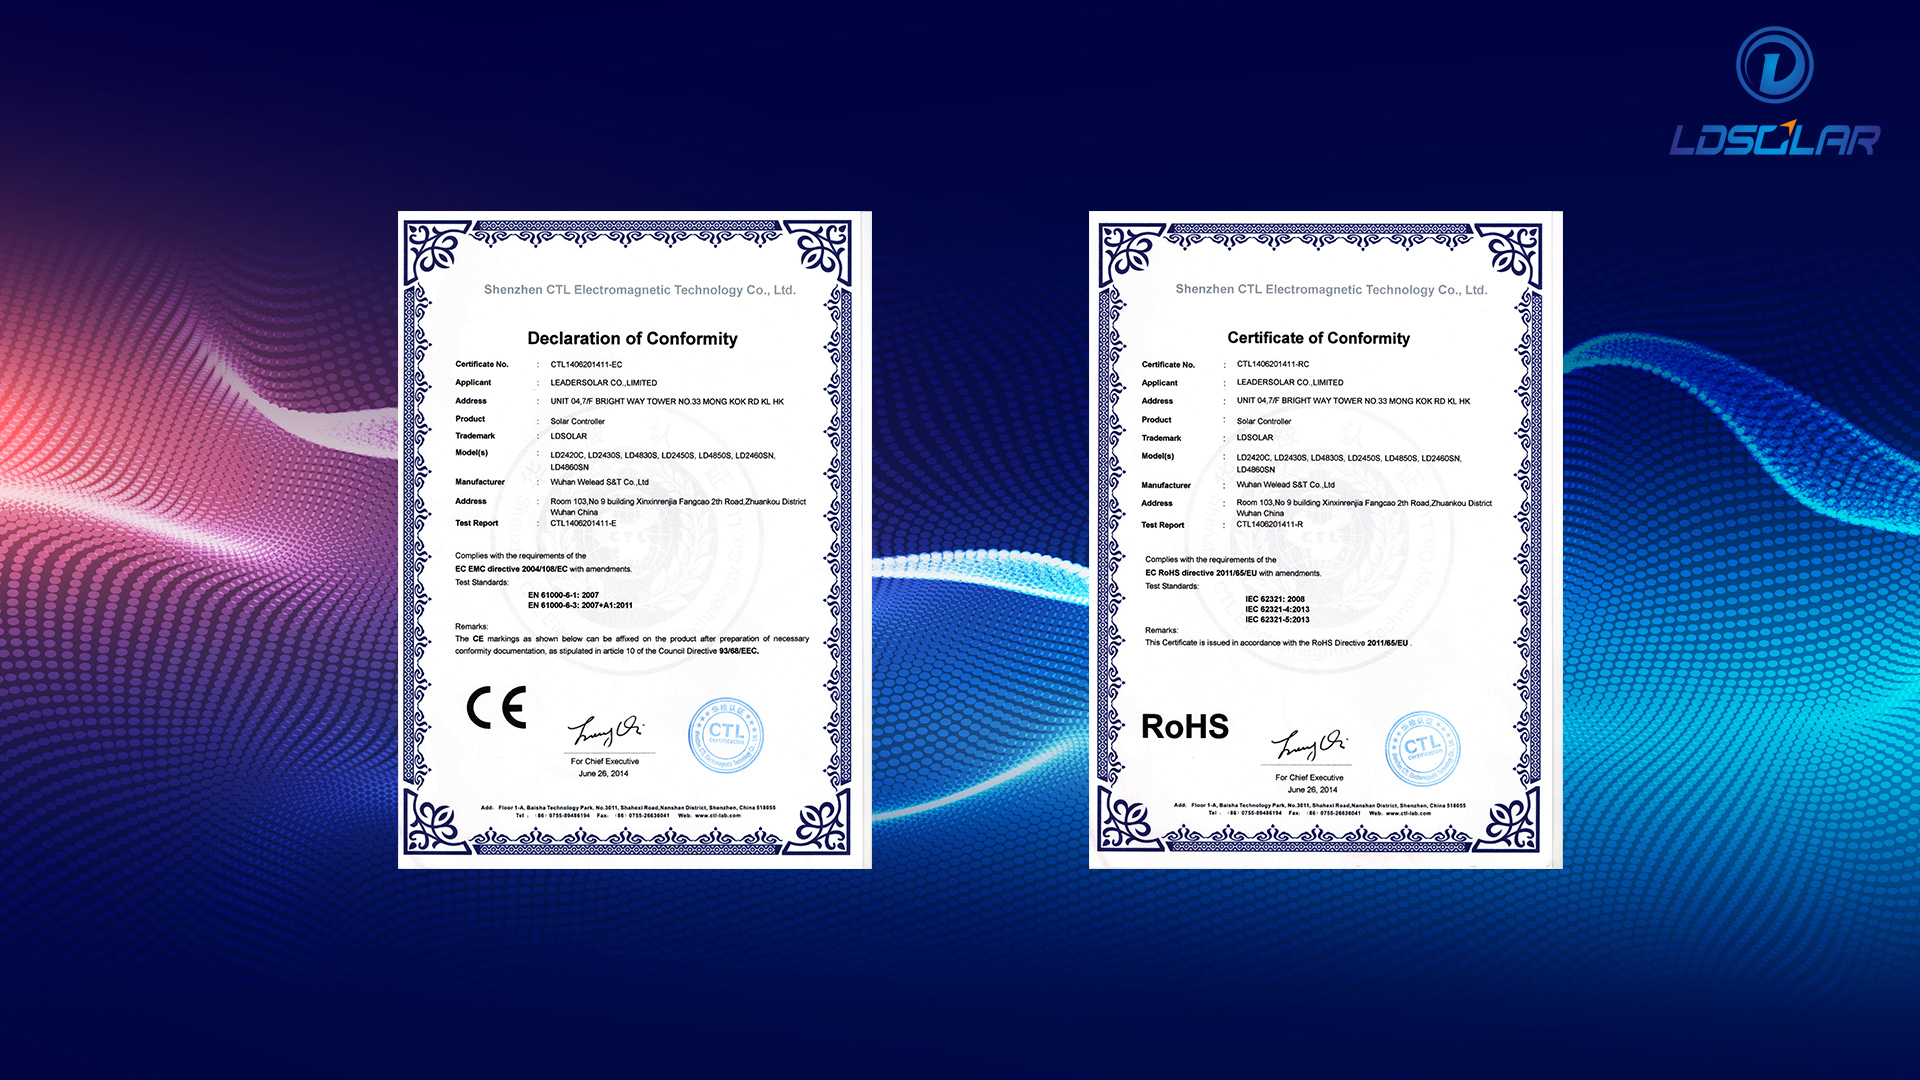 Ldsolar certificate of conformity